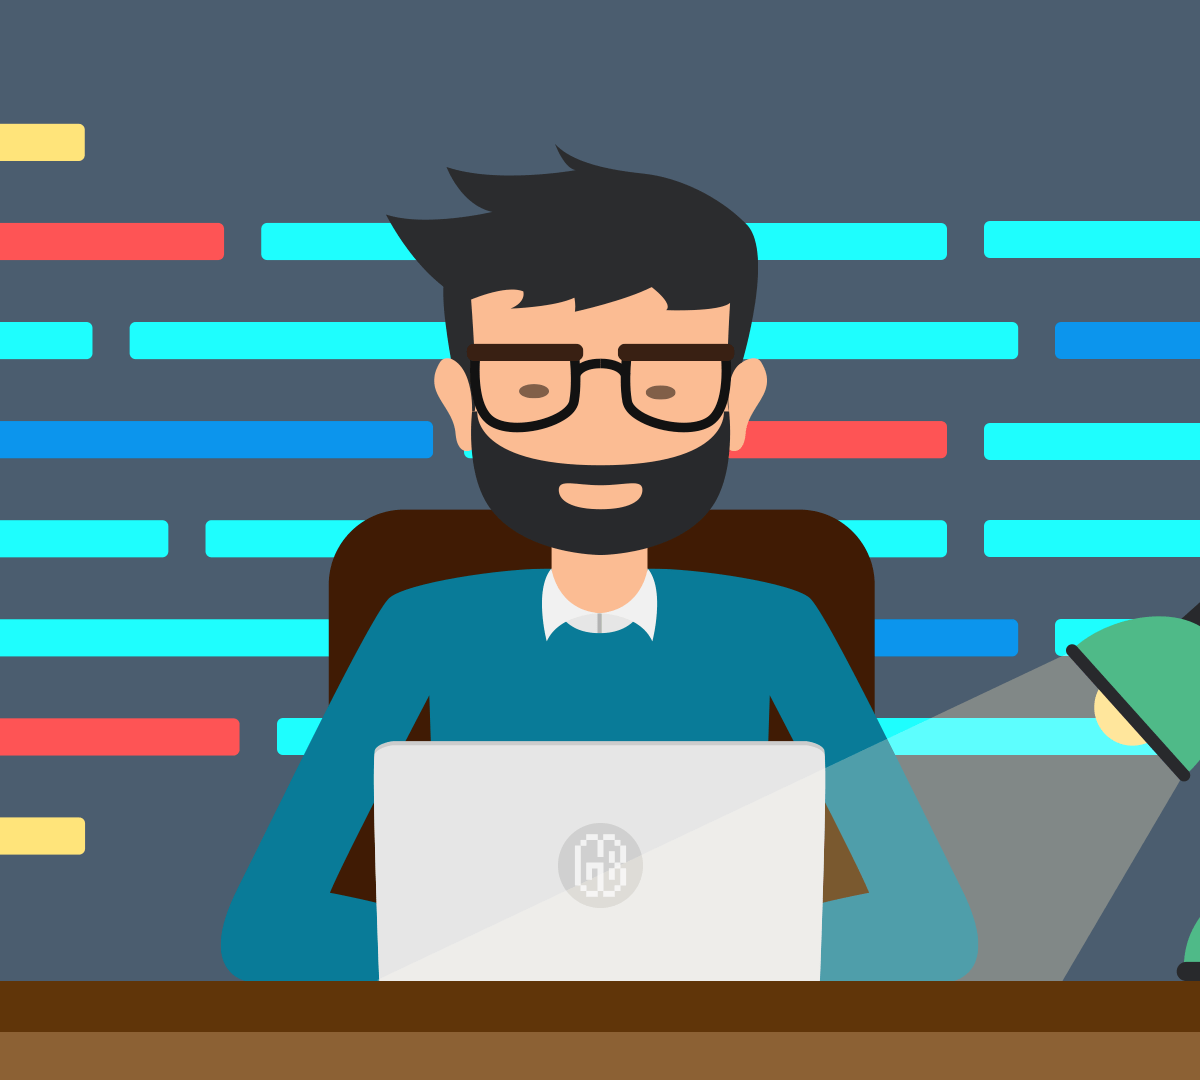 Аватар фриланс поиск работы freelance